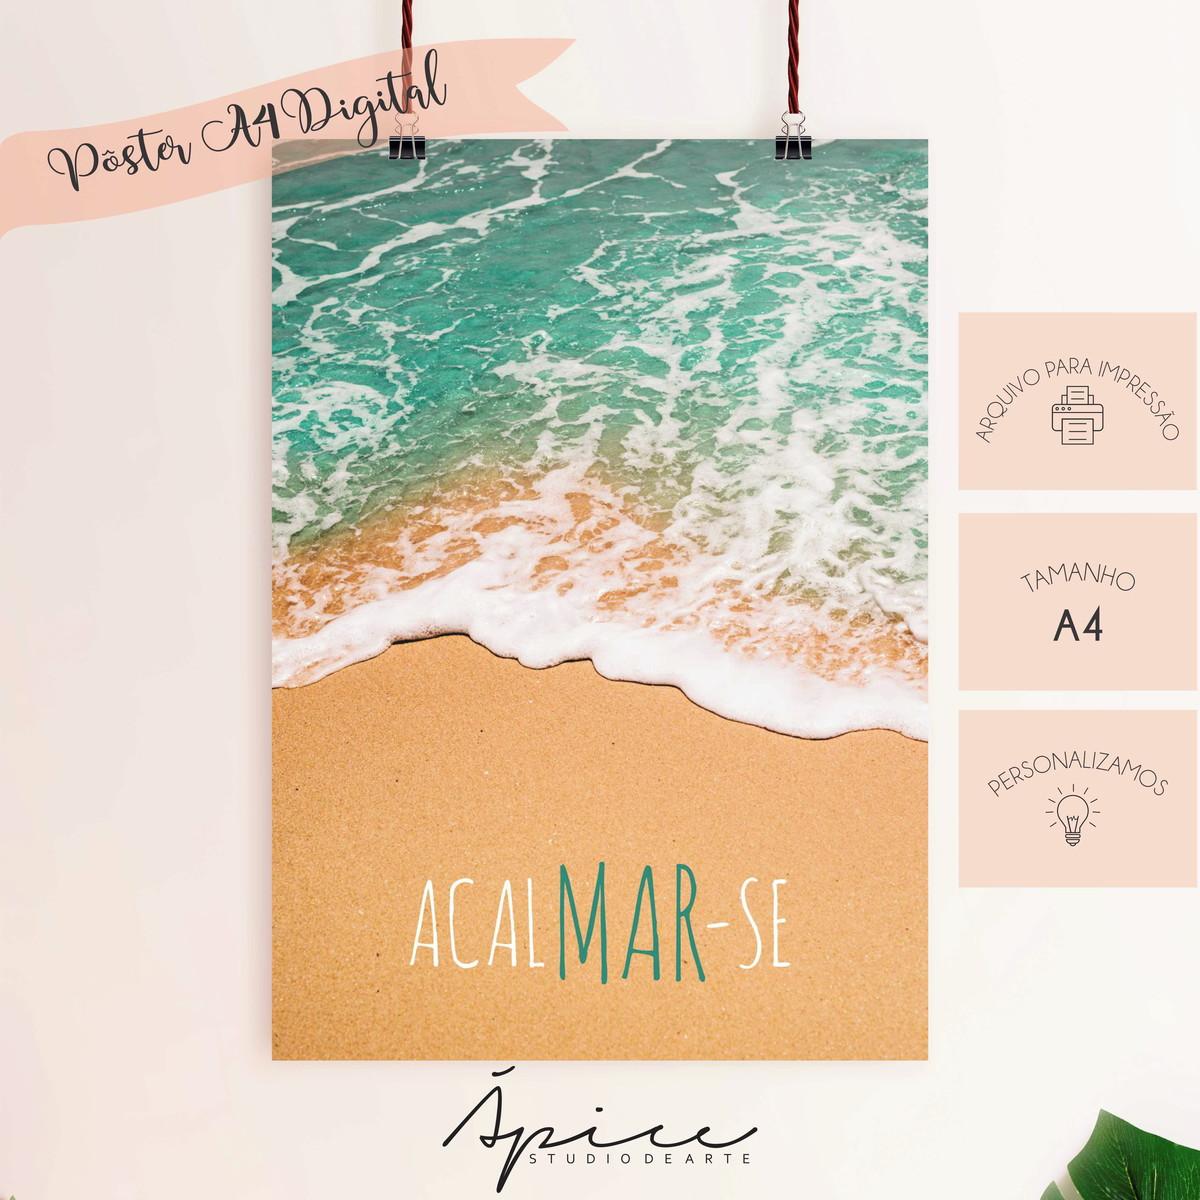 Pôster Digital A4 Frase Acalmar Se Mar Praia Verão Beach